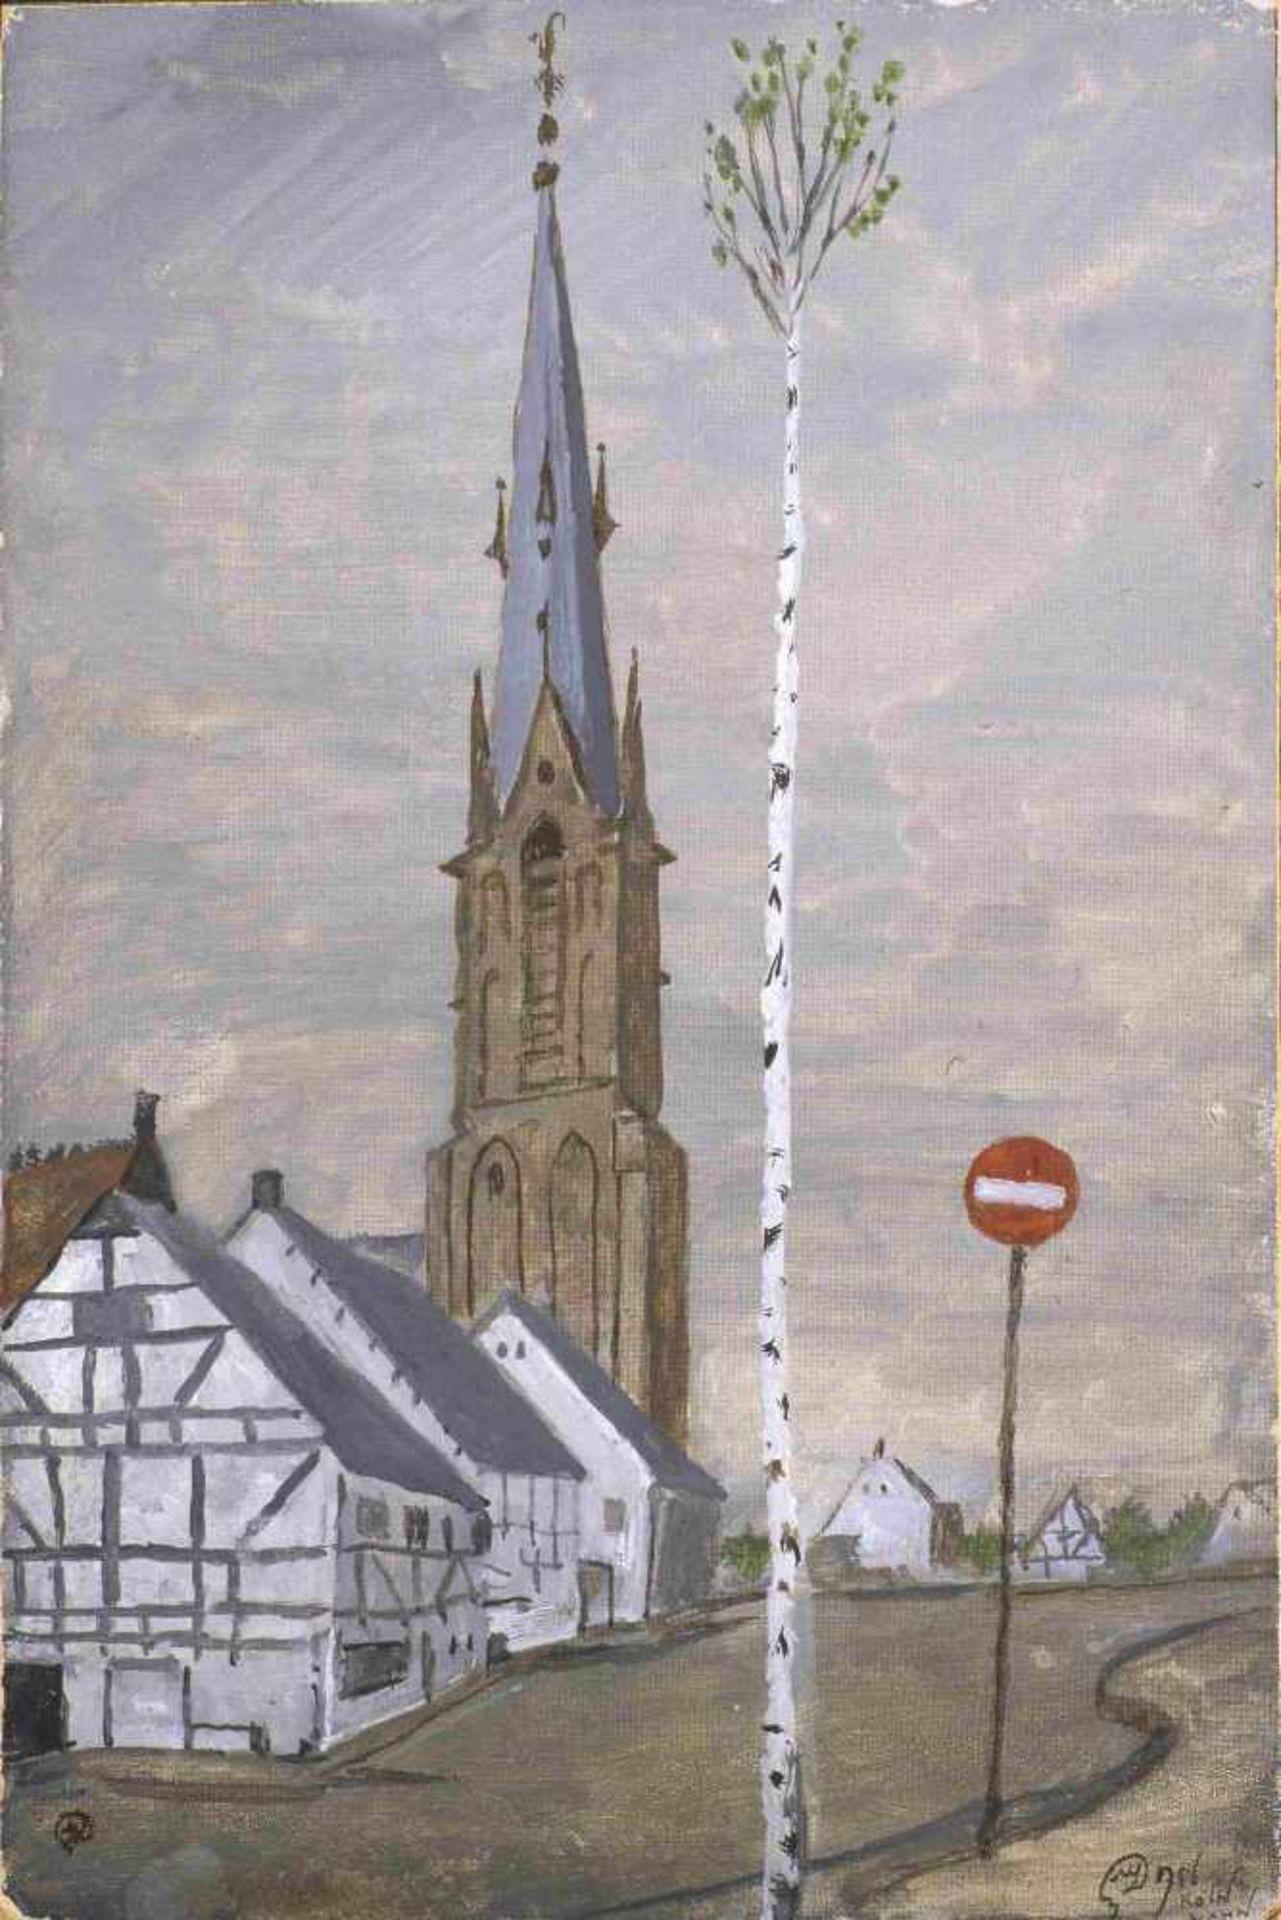 Mstislav Dobuzhinski (1875-1957) Köln. Stadtteil Wahn 1956 Karton, Gouache 30,3 х 20,1 cm R. u.